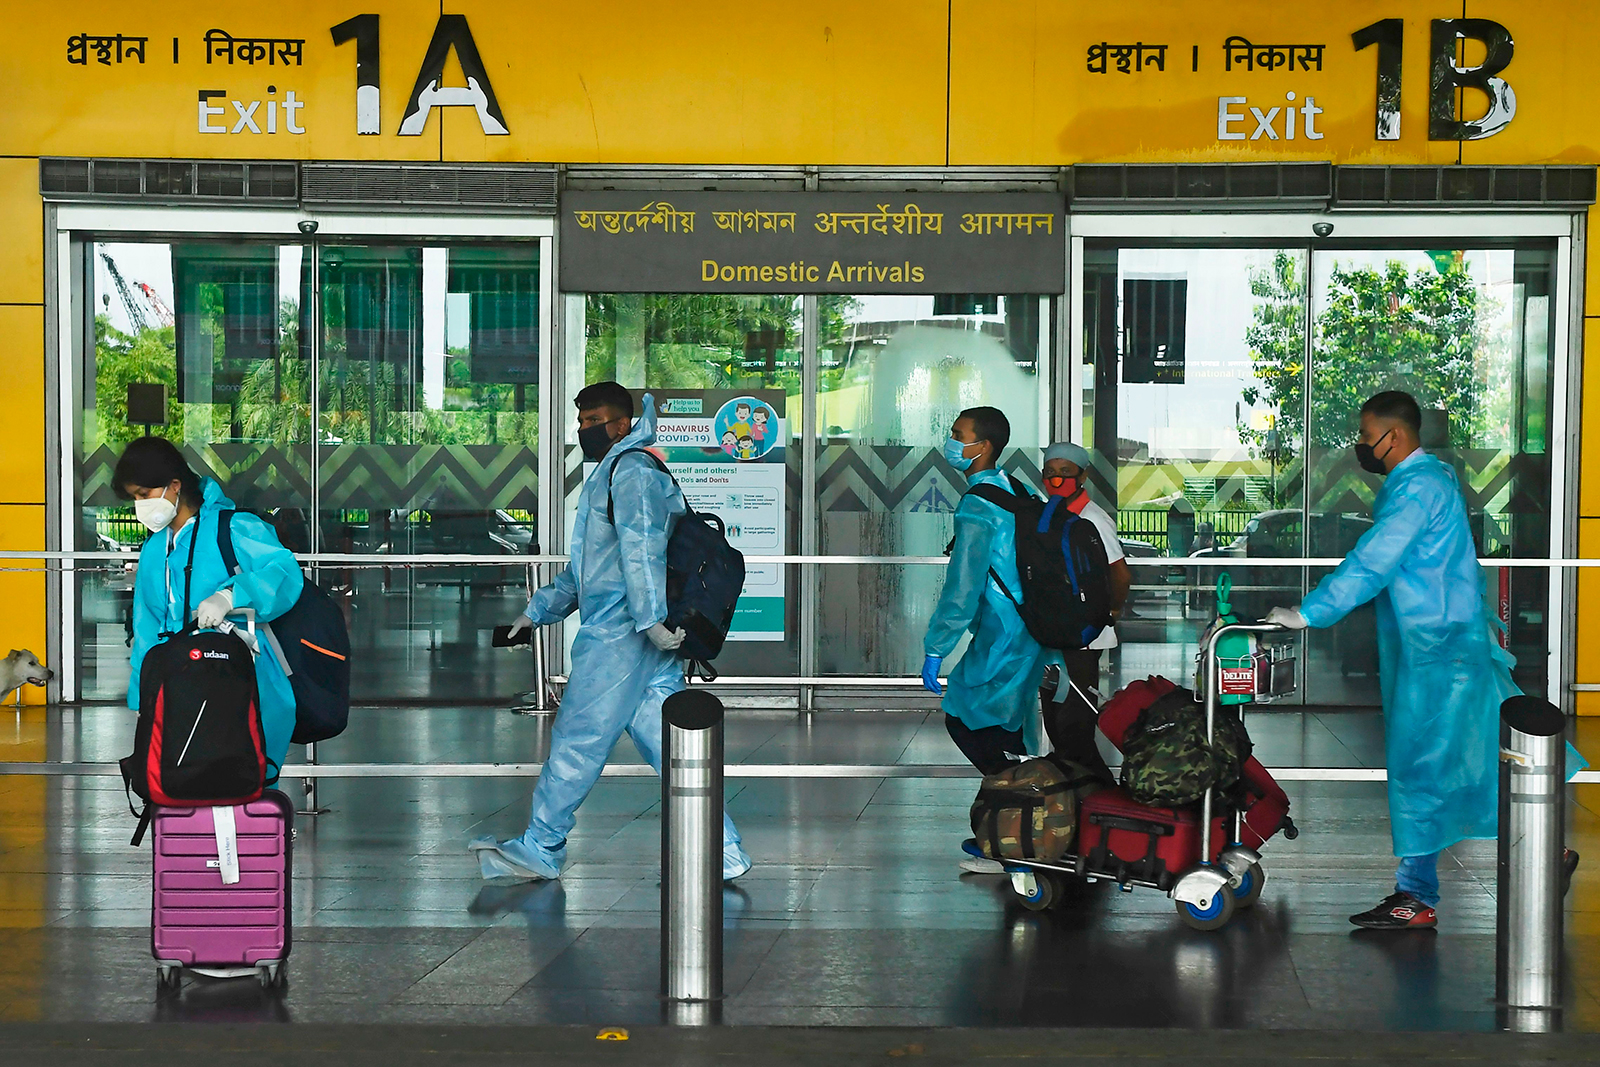 Air passengers wearing protective suits at Netaji Subhas Chandra Bose International Airport in Kolkata, India on July 6.